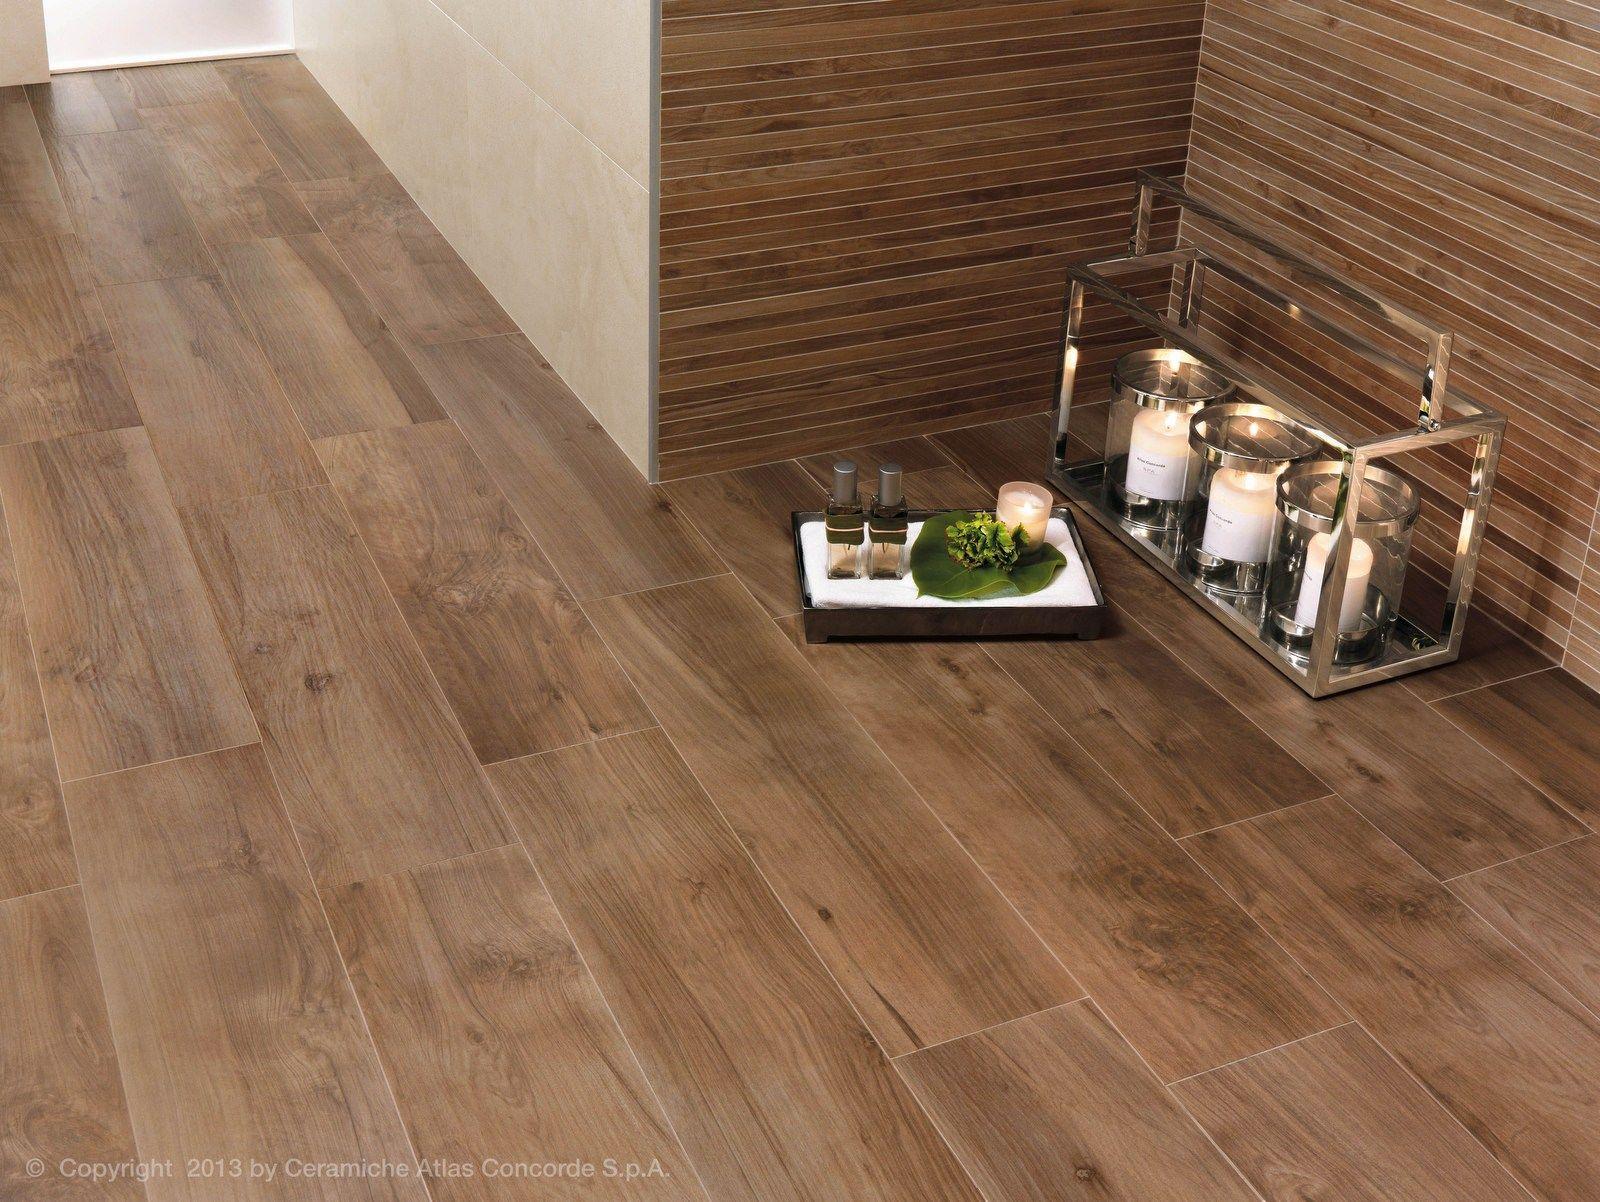 Etic porcelain stoneware flooring etic collection by atlas concorde - Carrelage atlas concorde ...